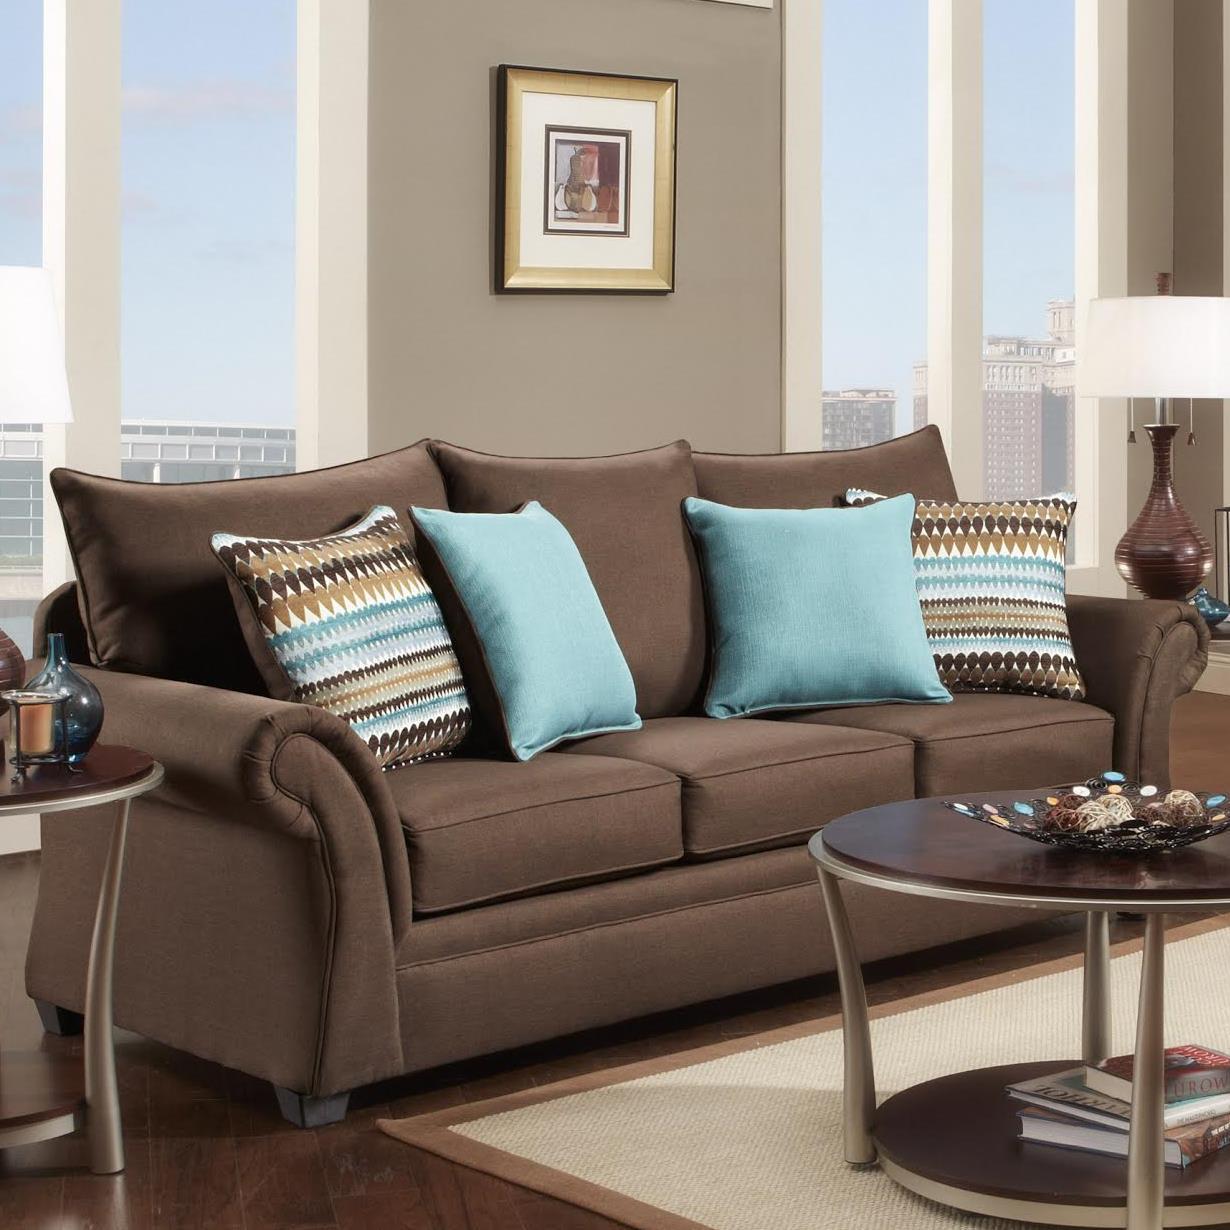 1560 Sofa by Washington Furniture at Lynn's Furniture & Mattress